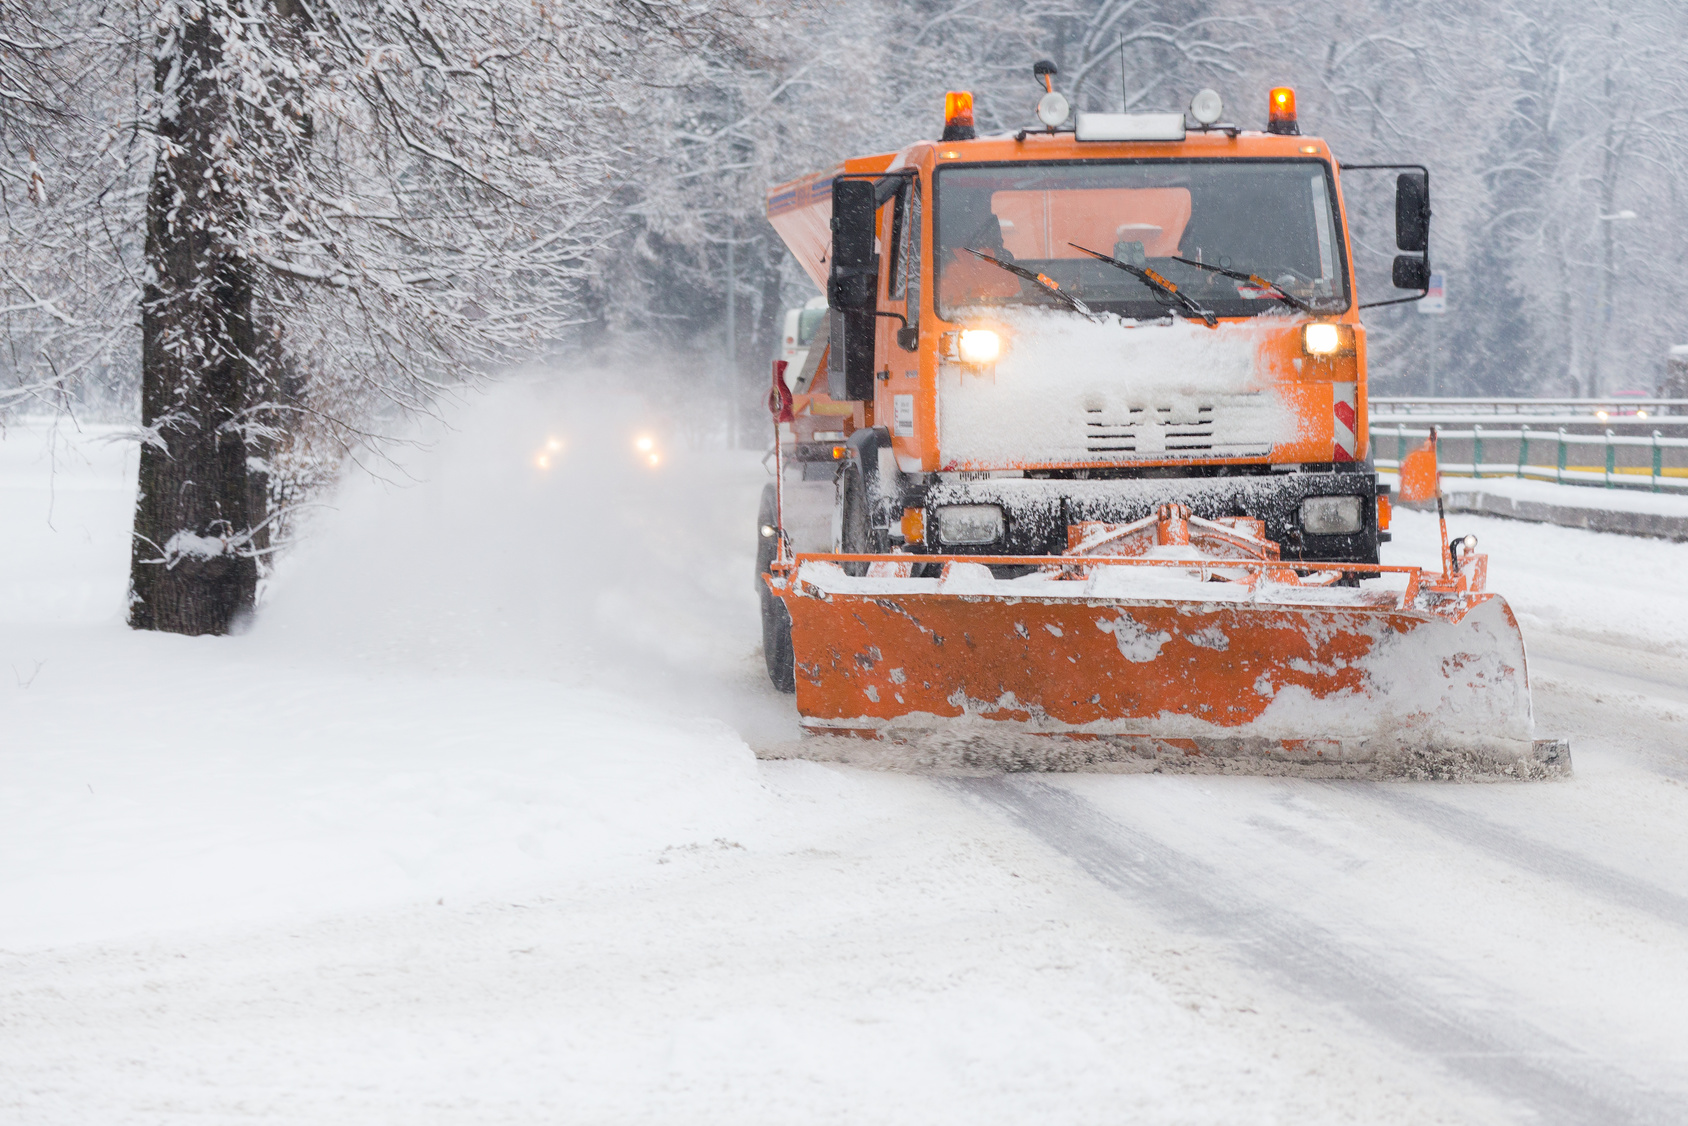 snowplow and snow calamity